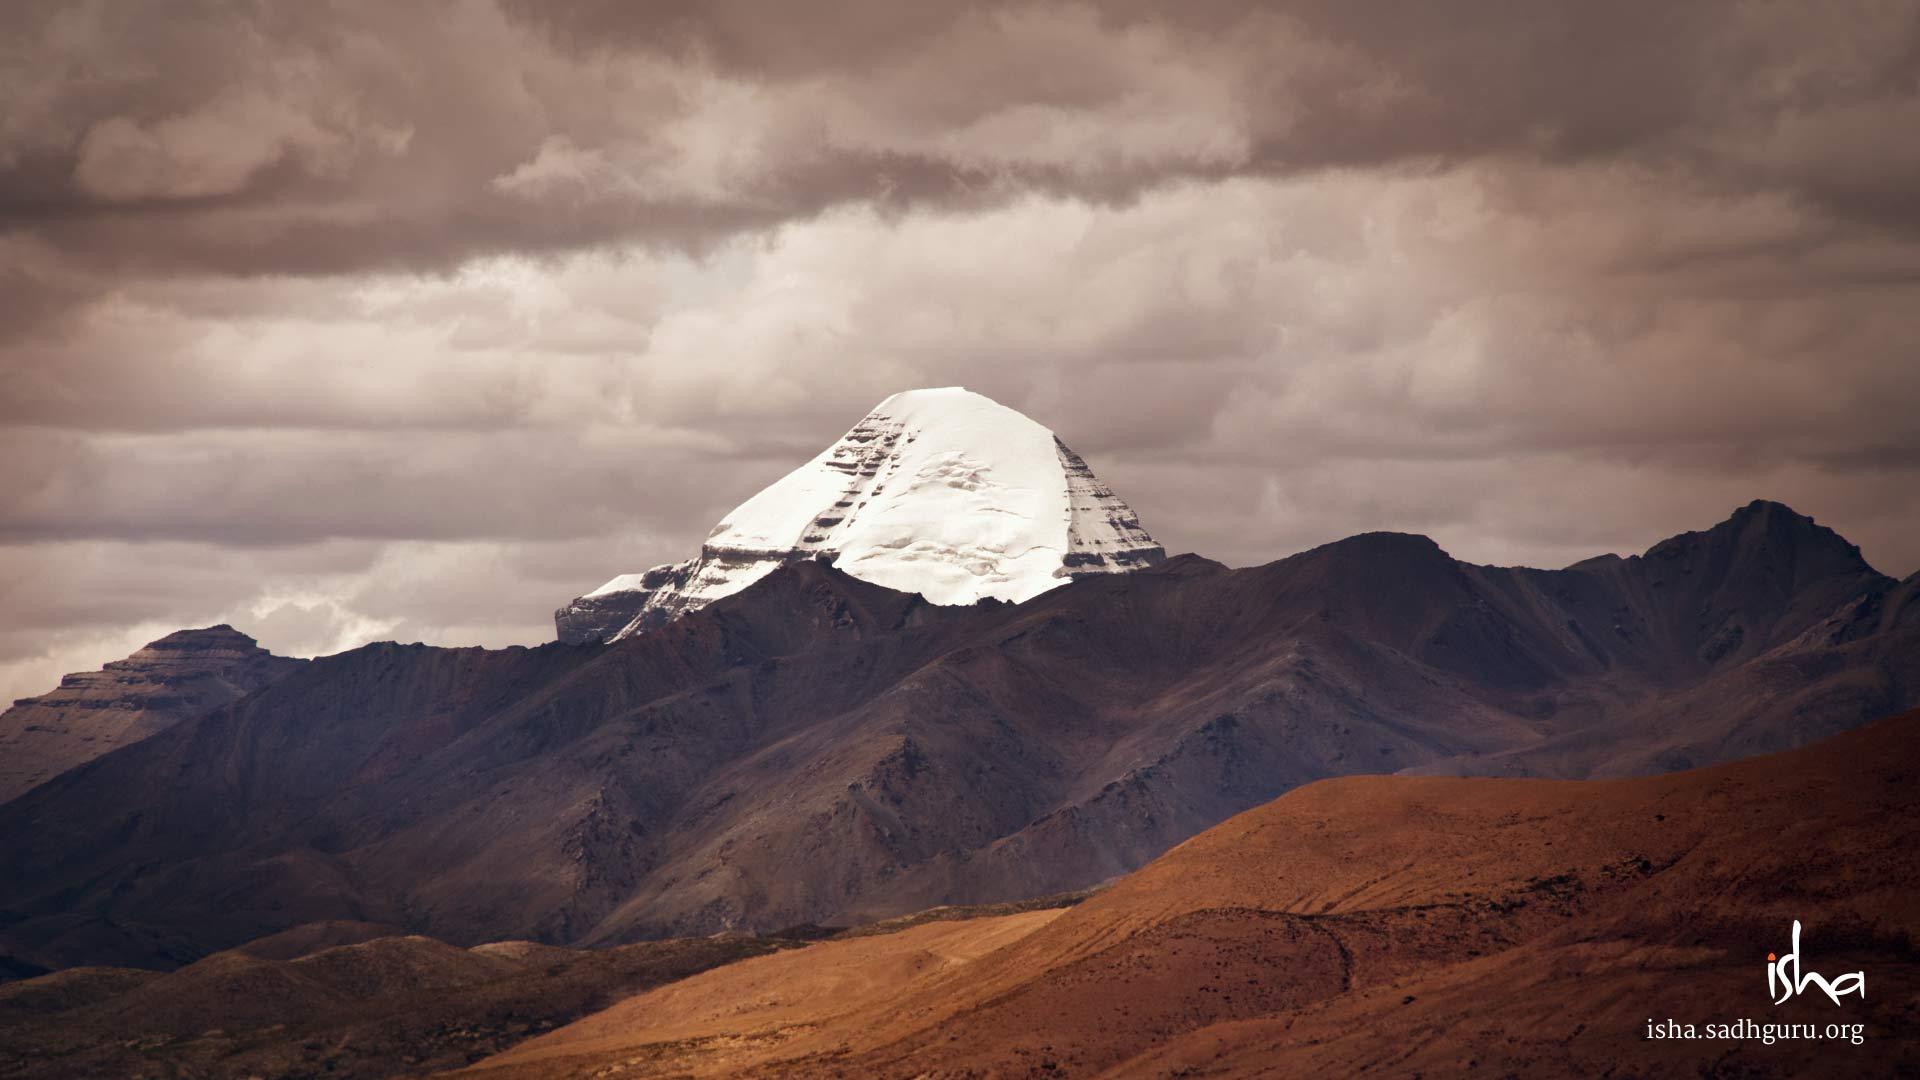 mahashivratri images and wallpapers